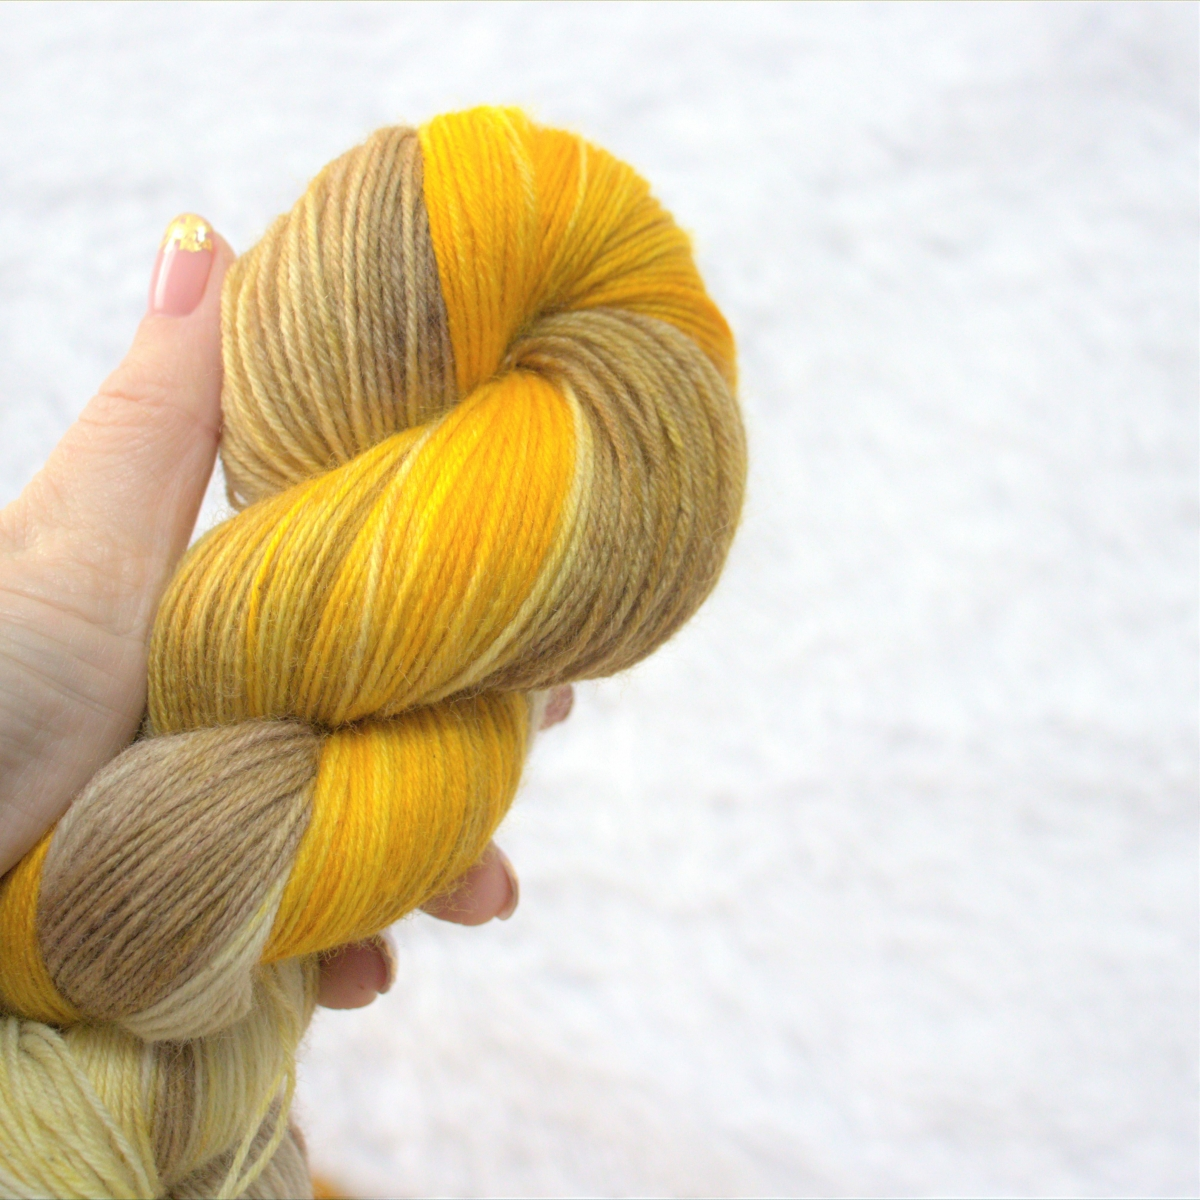 woodico.pro hand dyed yarn 049 3 1200x1200 - Hand dyed yarn / 049